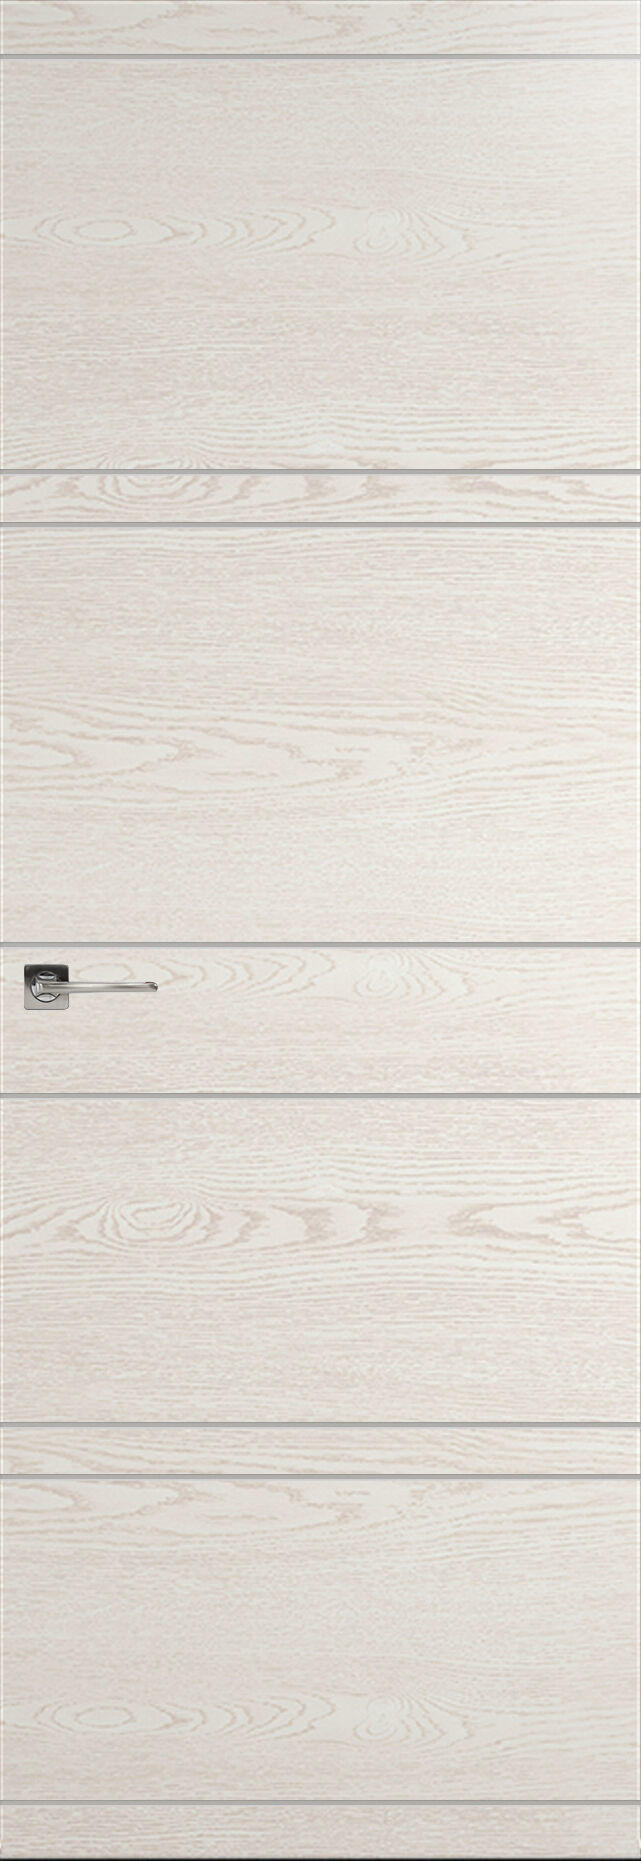 Tivoli Е-2 Невидимка цвет - Белый ясень Без стекла (ДГ)